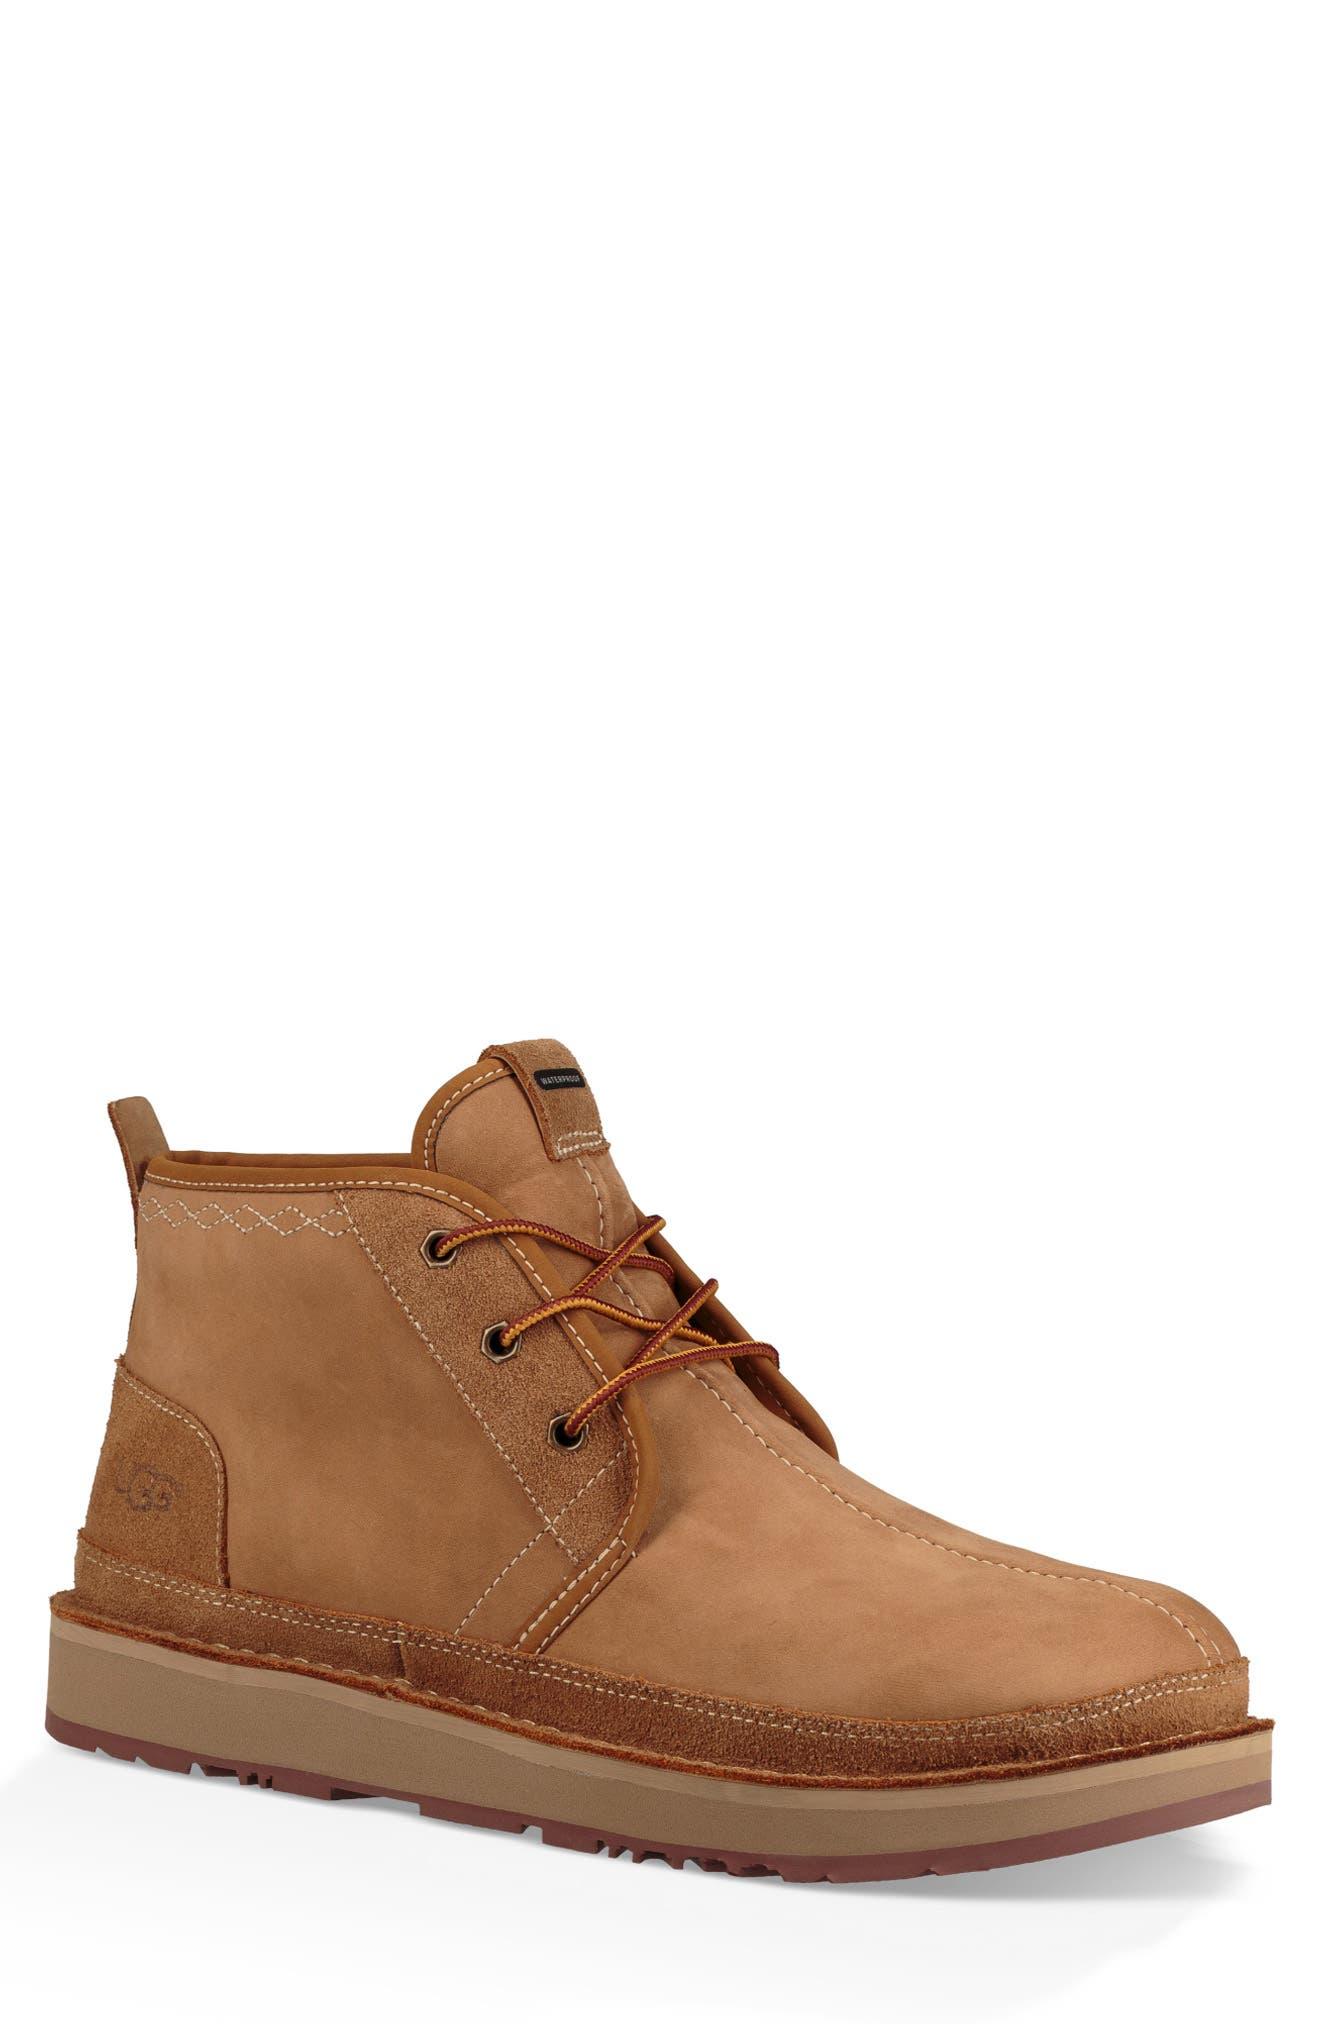 Ugg Avalance Neumel Waterproof Boot, Brown